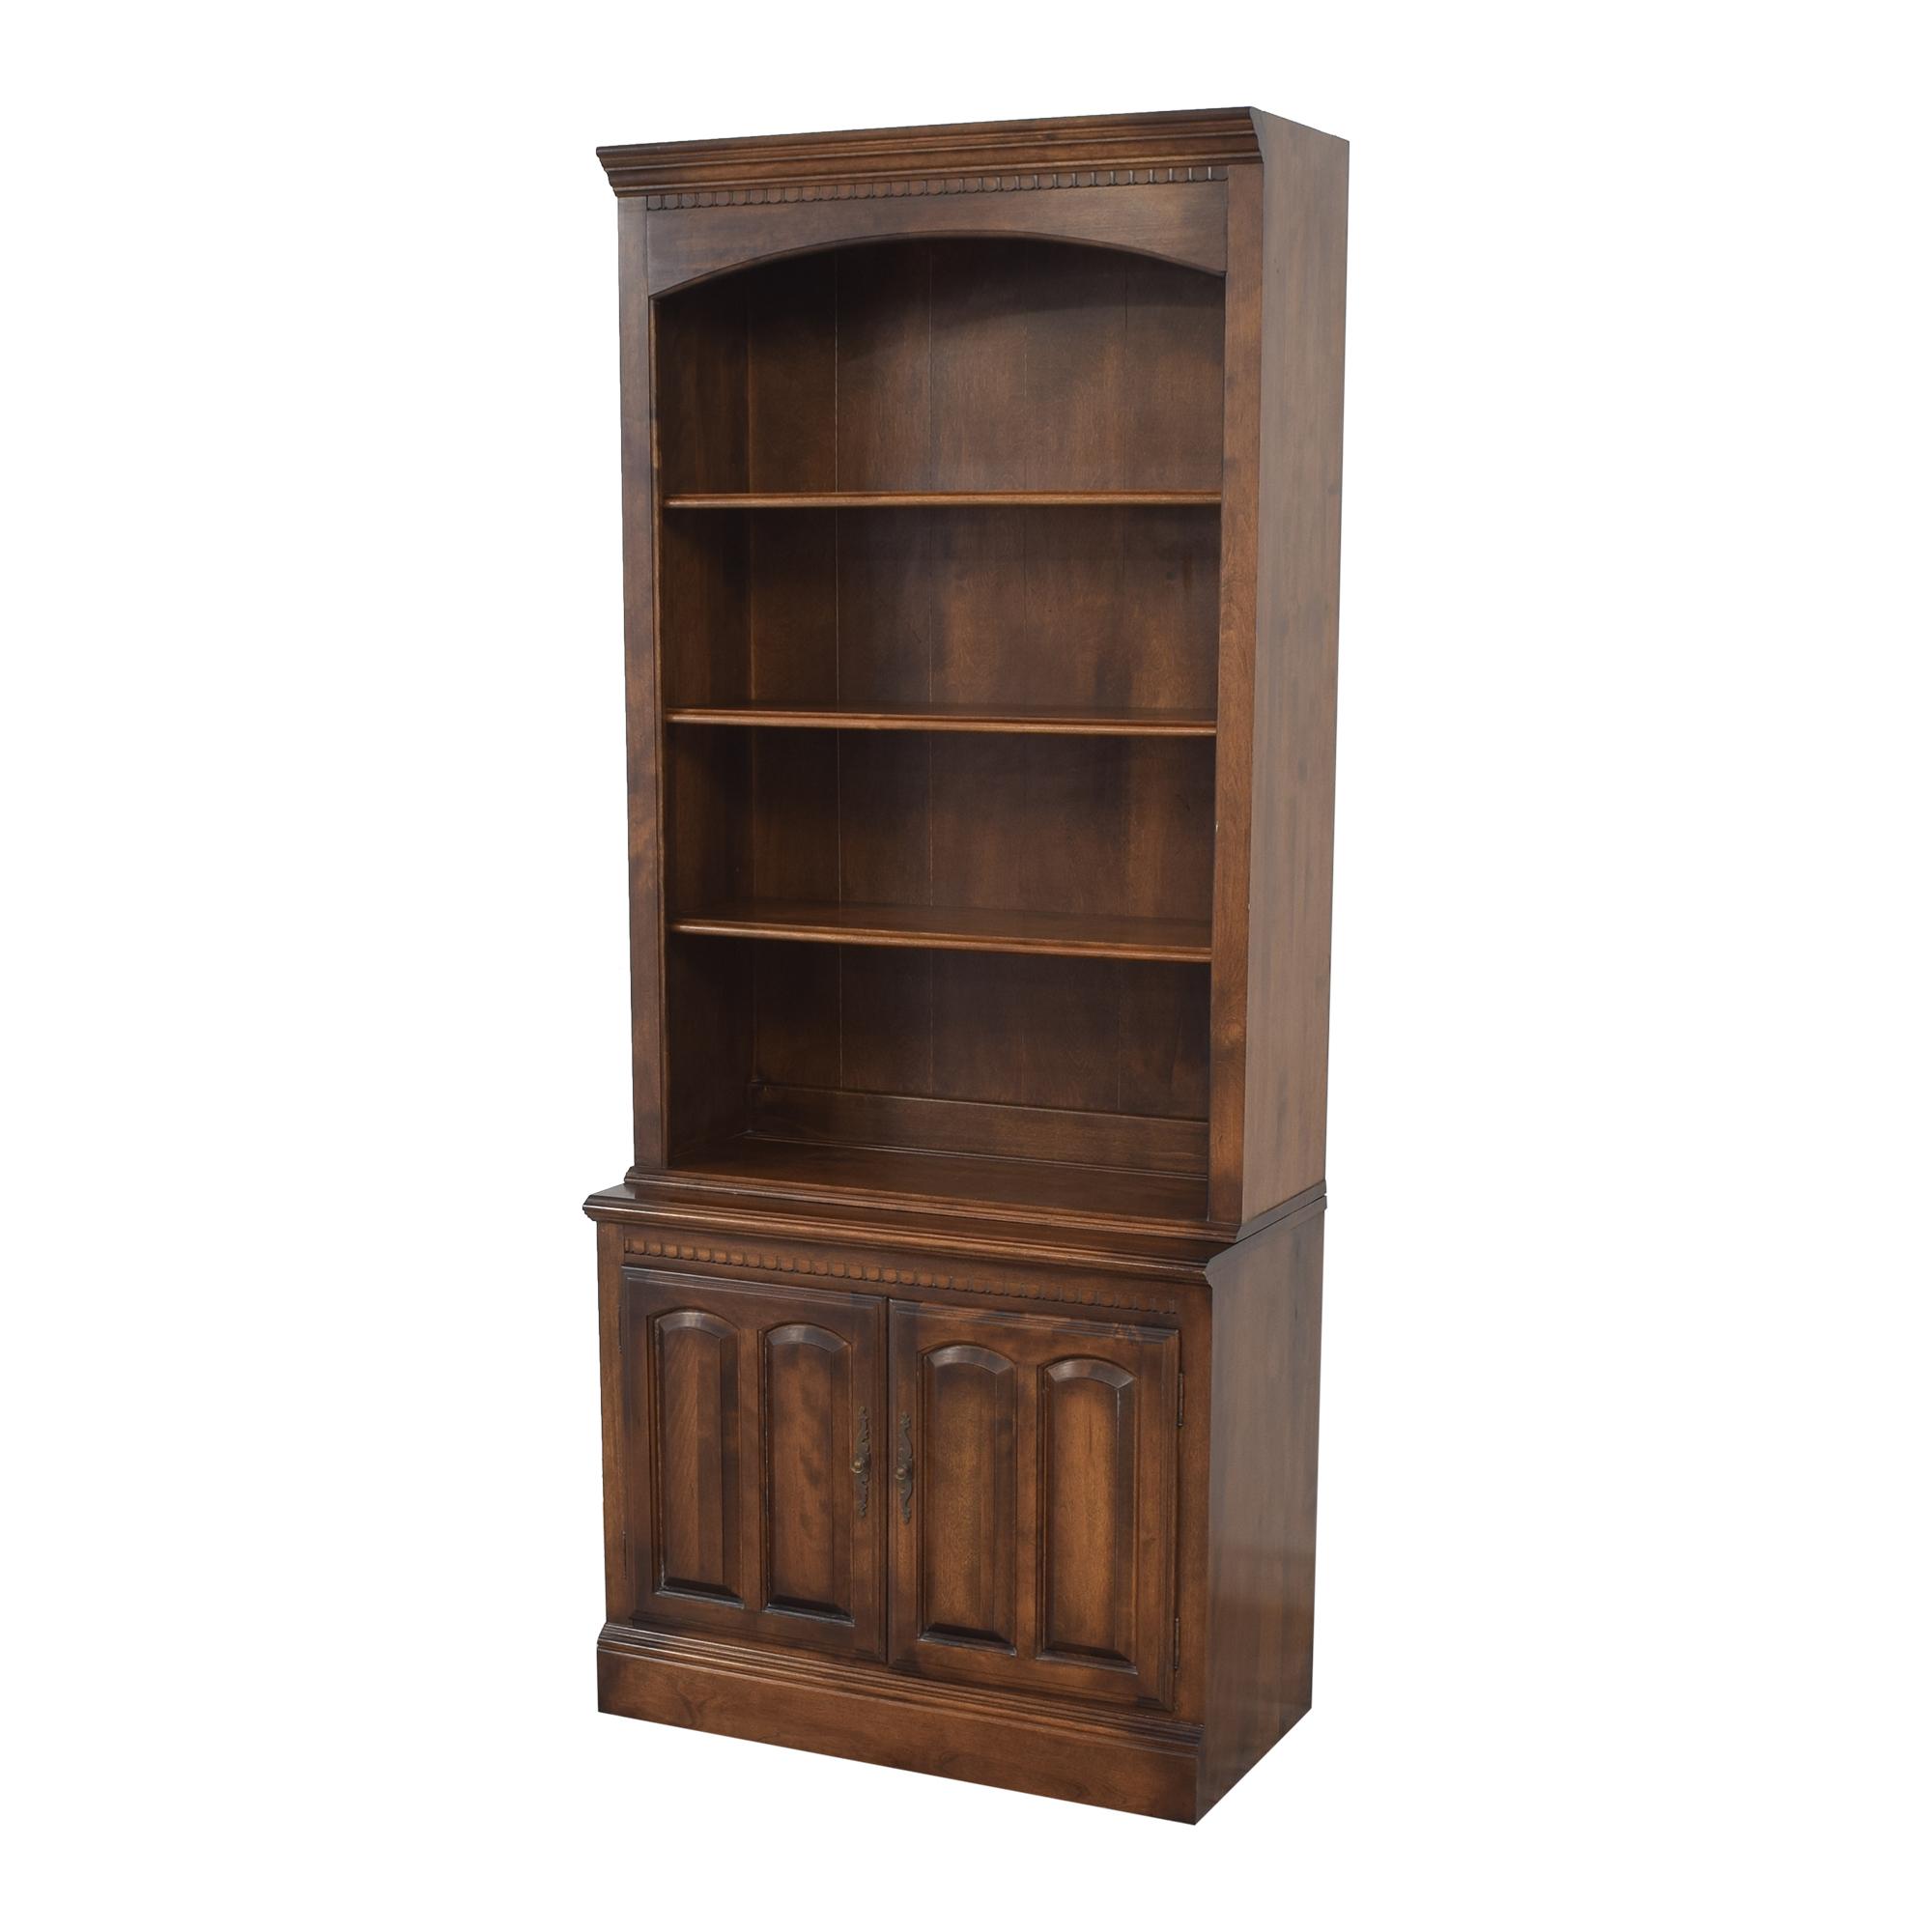 Ethan Allen Ethan Allen Classic Manor Bookcase dimensions